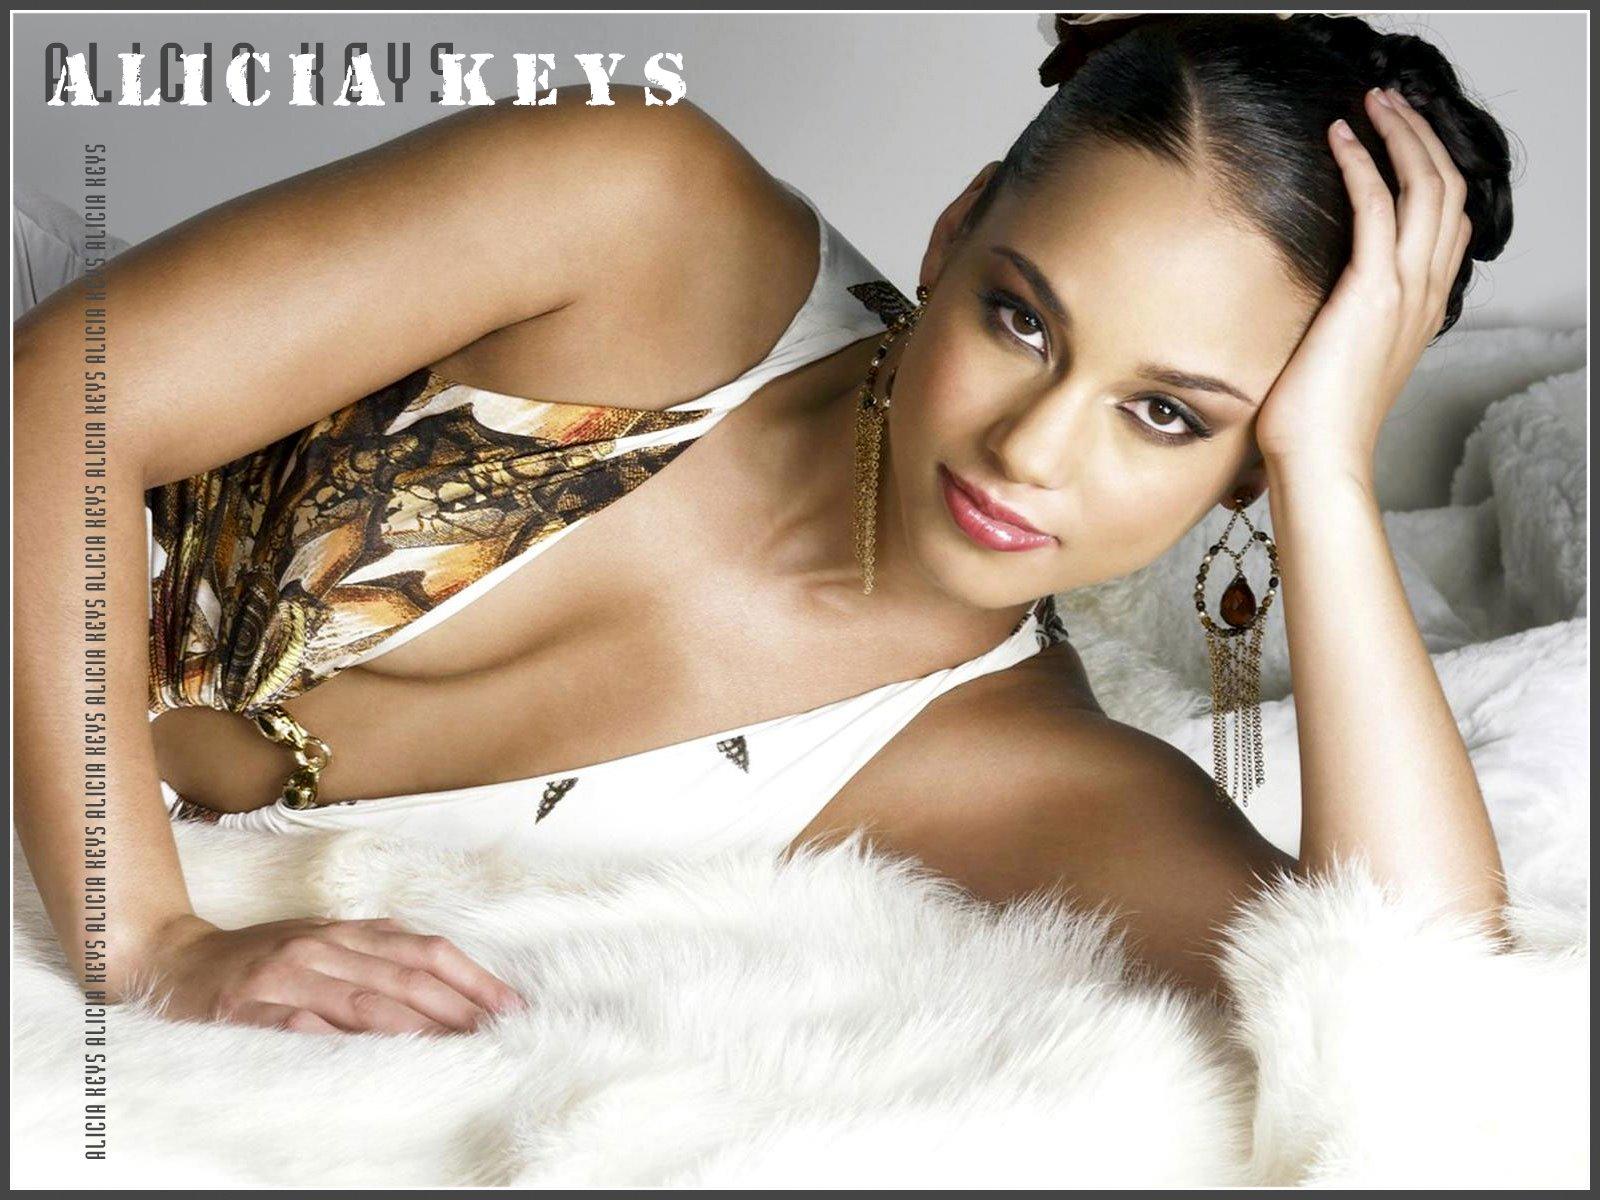 http://4.bp.blogspot.com/_JNh98yyLeXw/S-4ZX_DEubI/AAAAAAAAB9M/feeuqEq9rgc/s1600/Beauty-Alicia_Keys0014.jpg